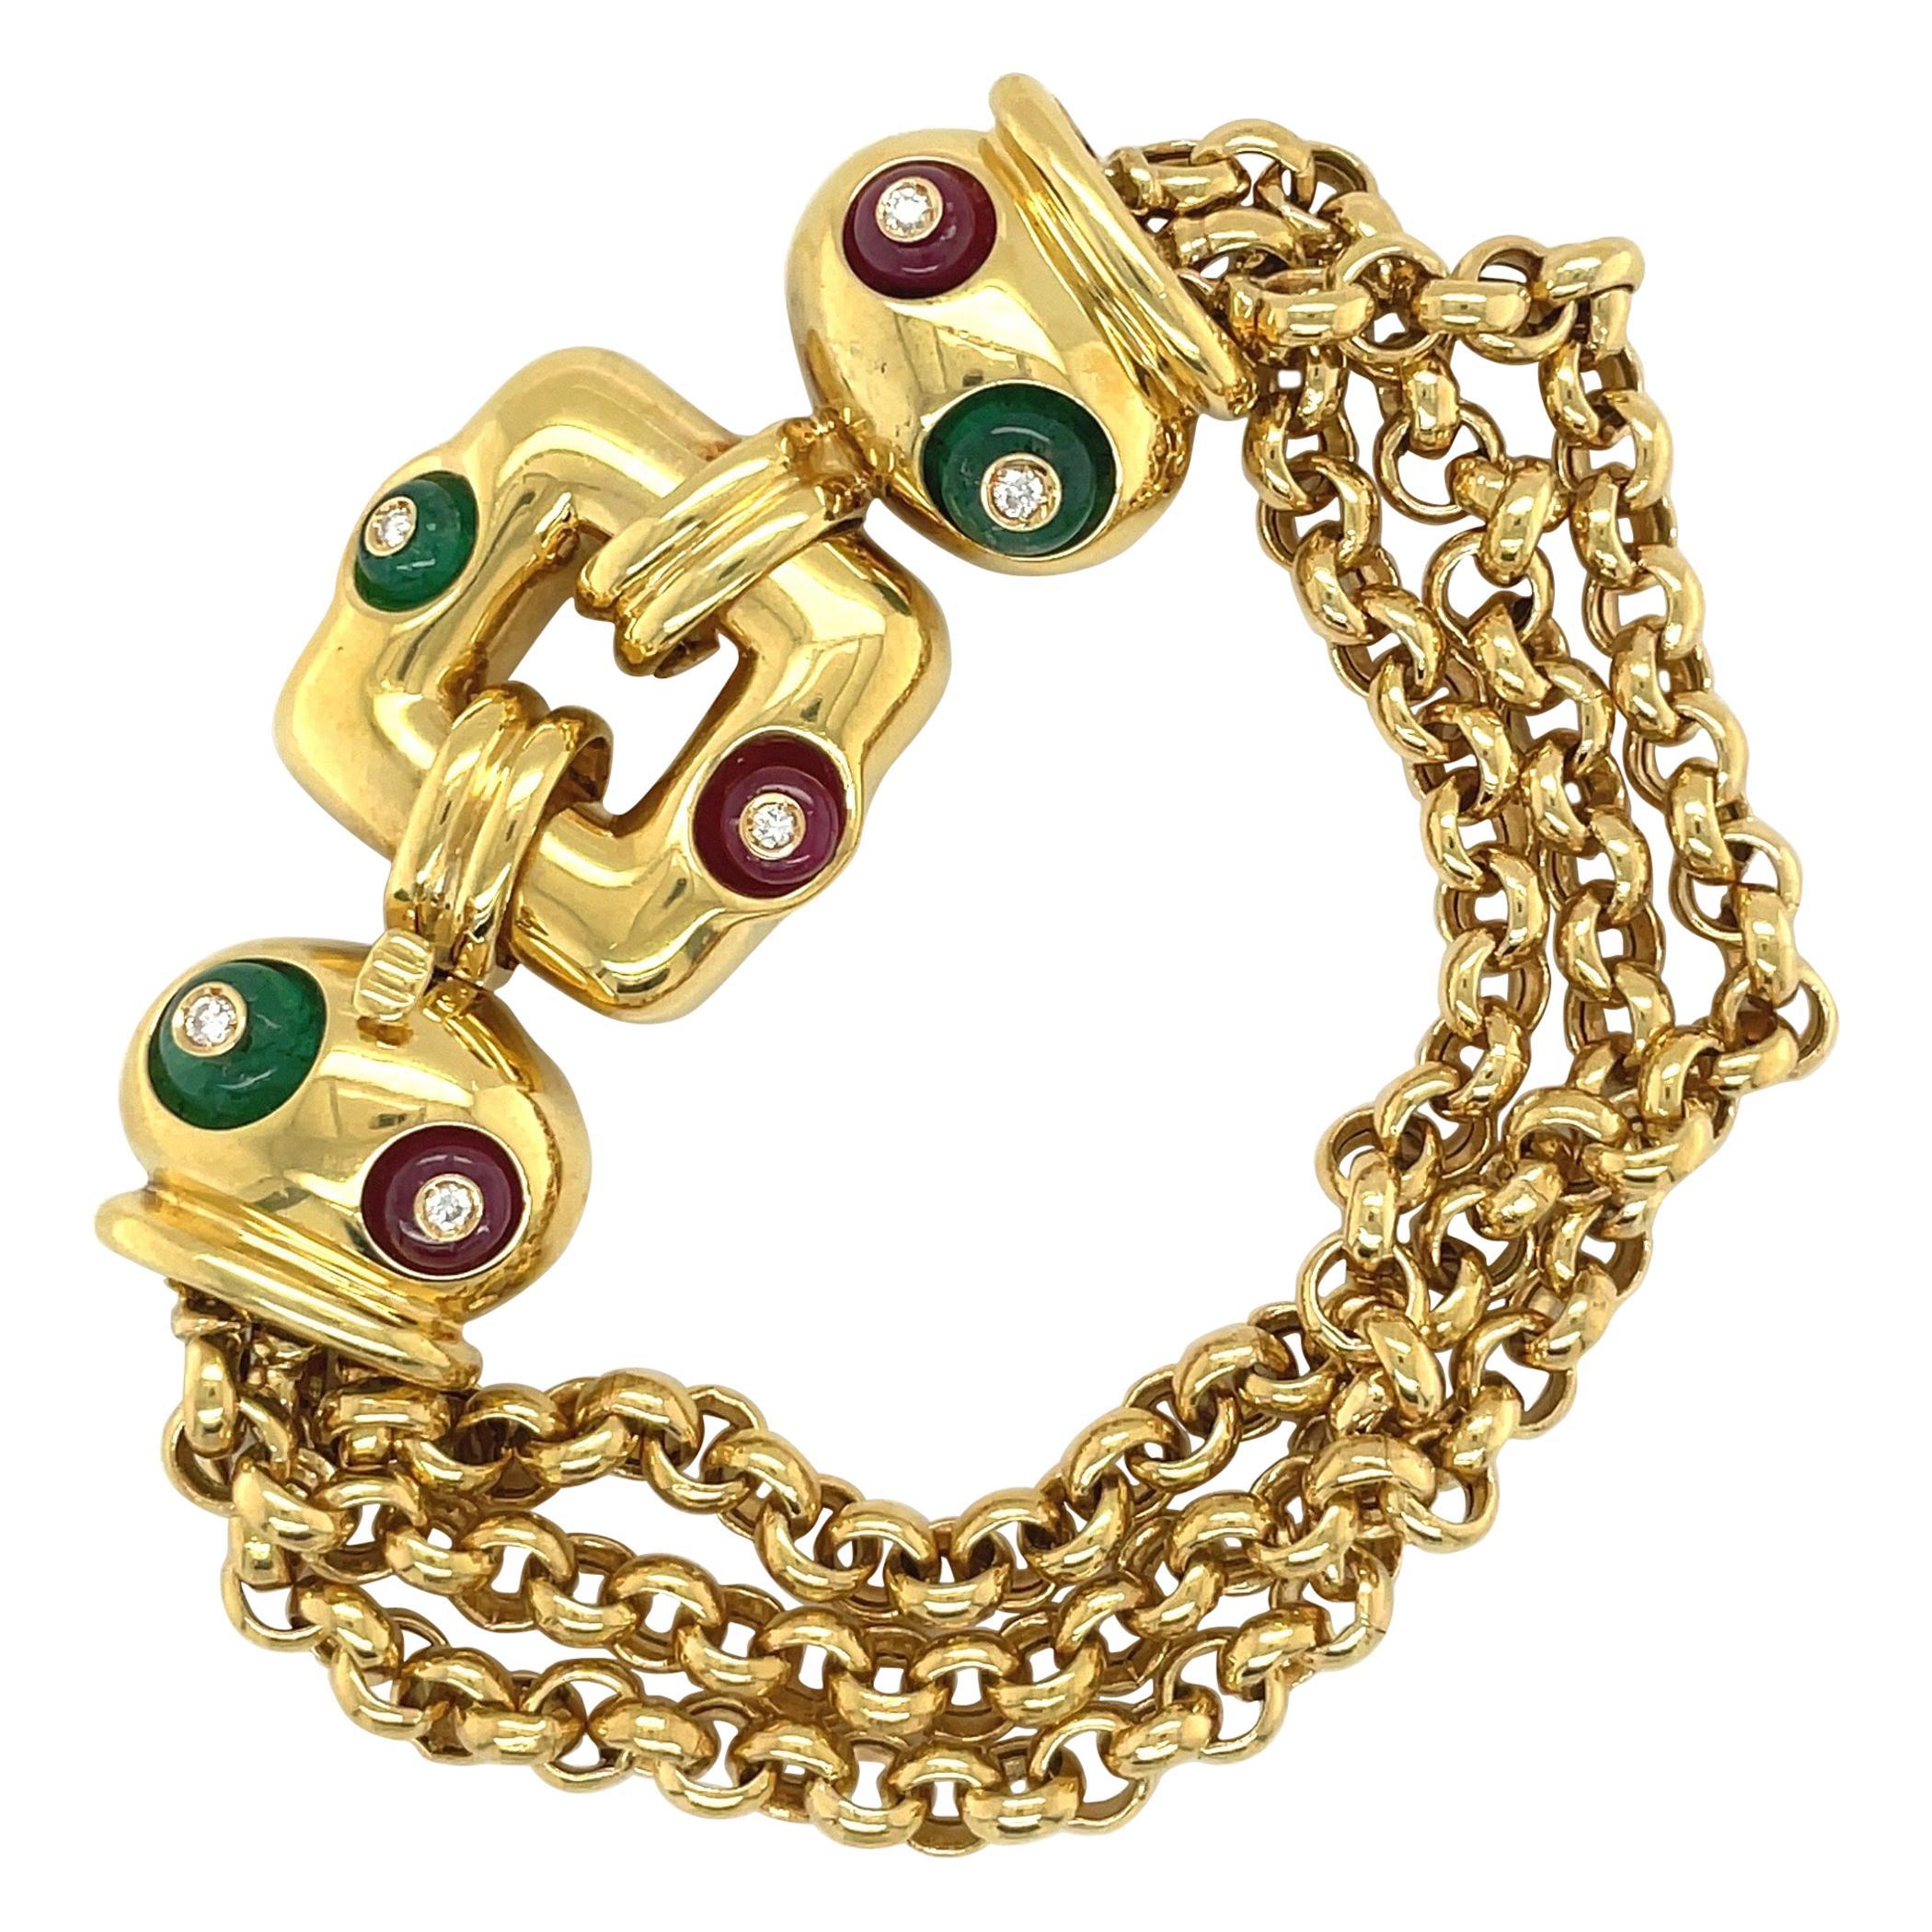 Nino Verita 18kt Yellow Gold Link Bracelet with Diamond, Beaded Ruby & Emerald